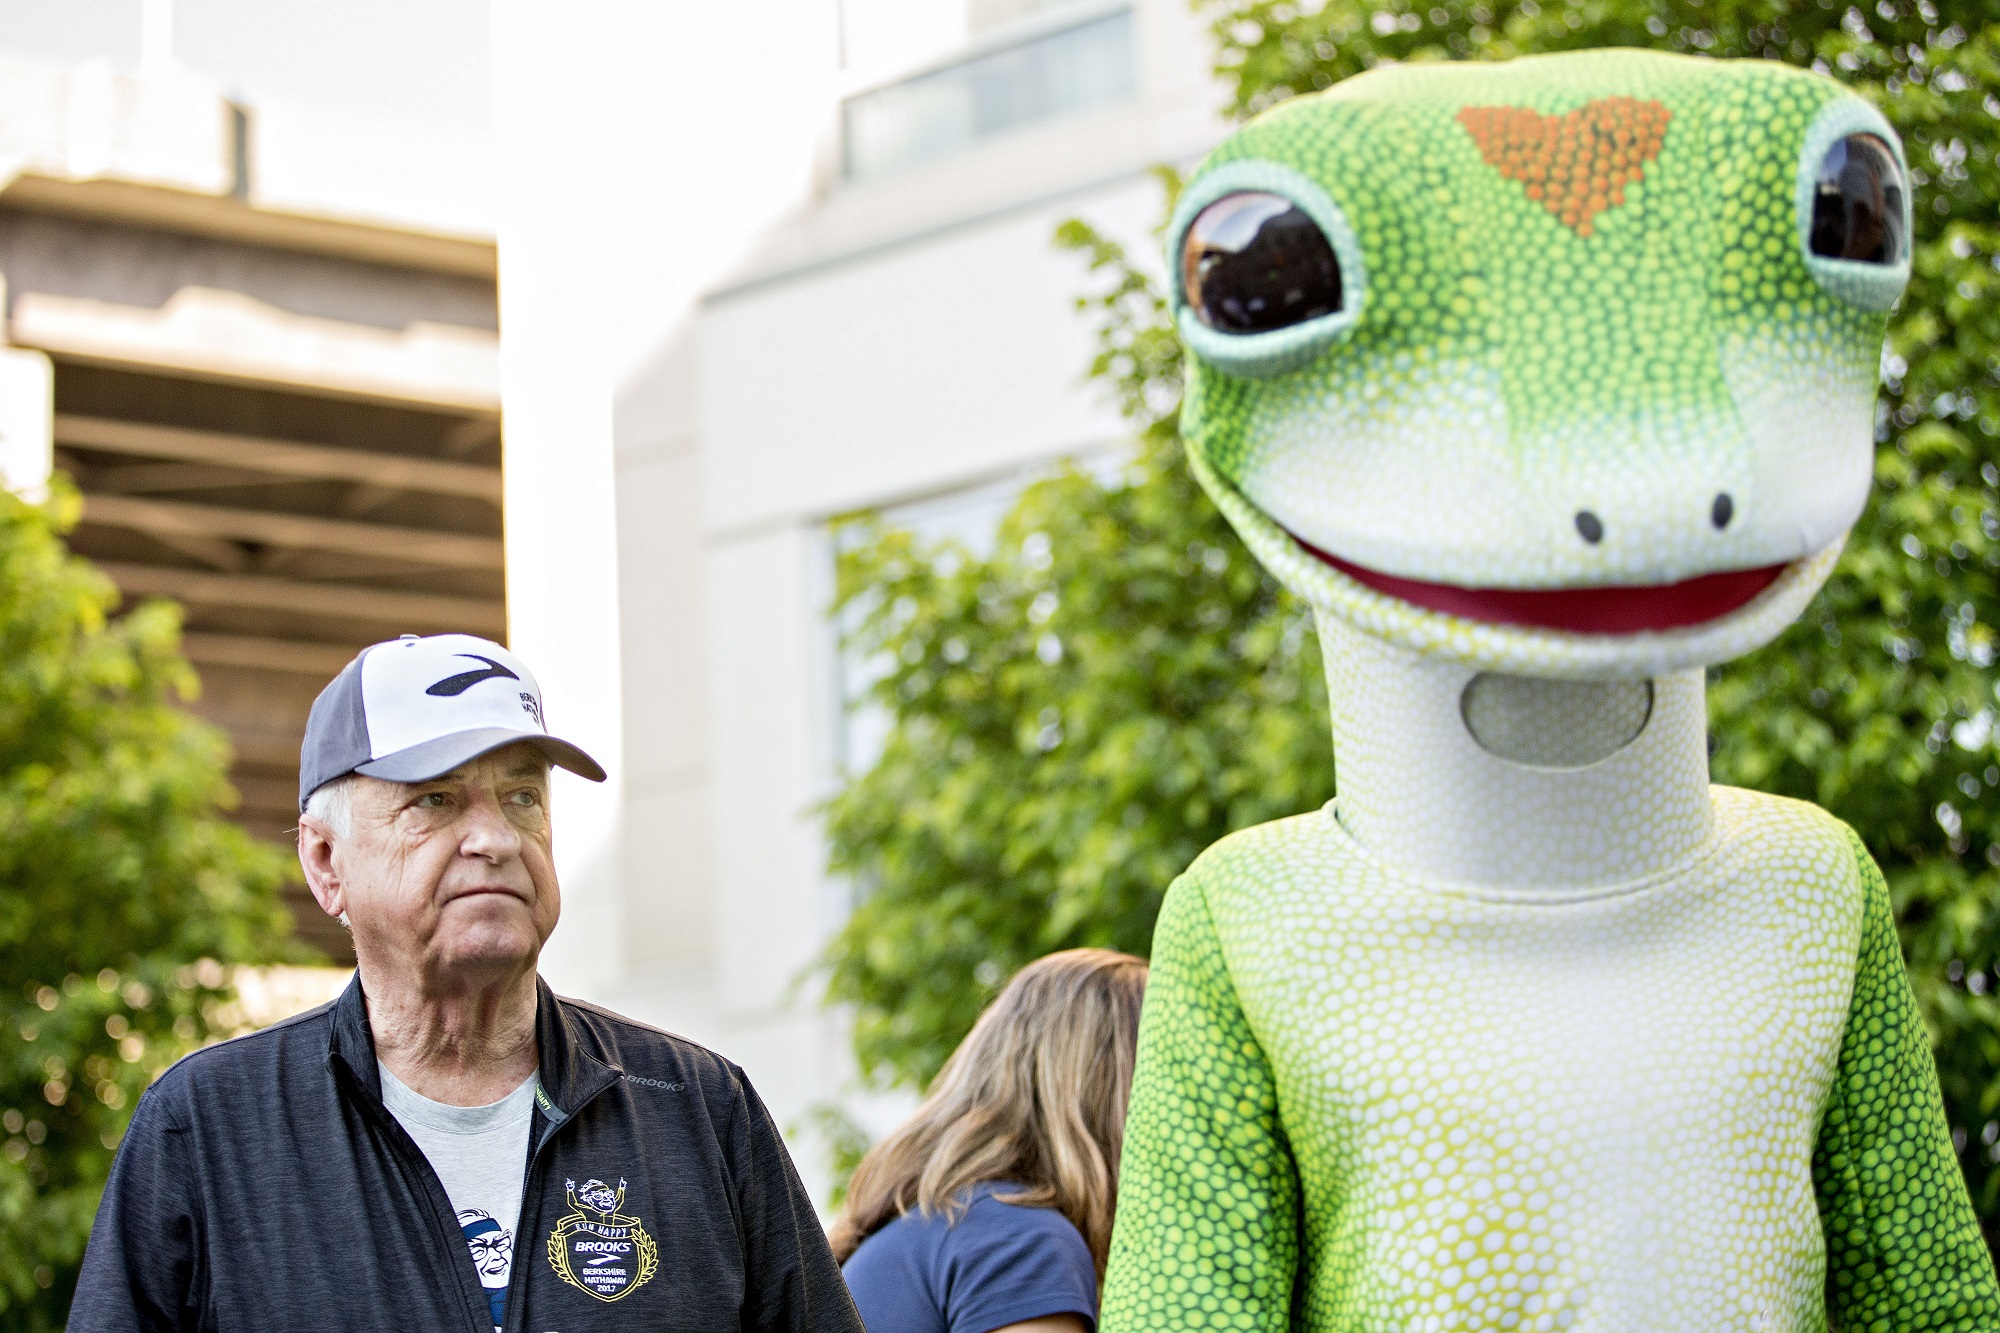 Tony Nicely, CEO of GEICO, alongside the GEICO gecko mascot